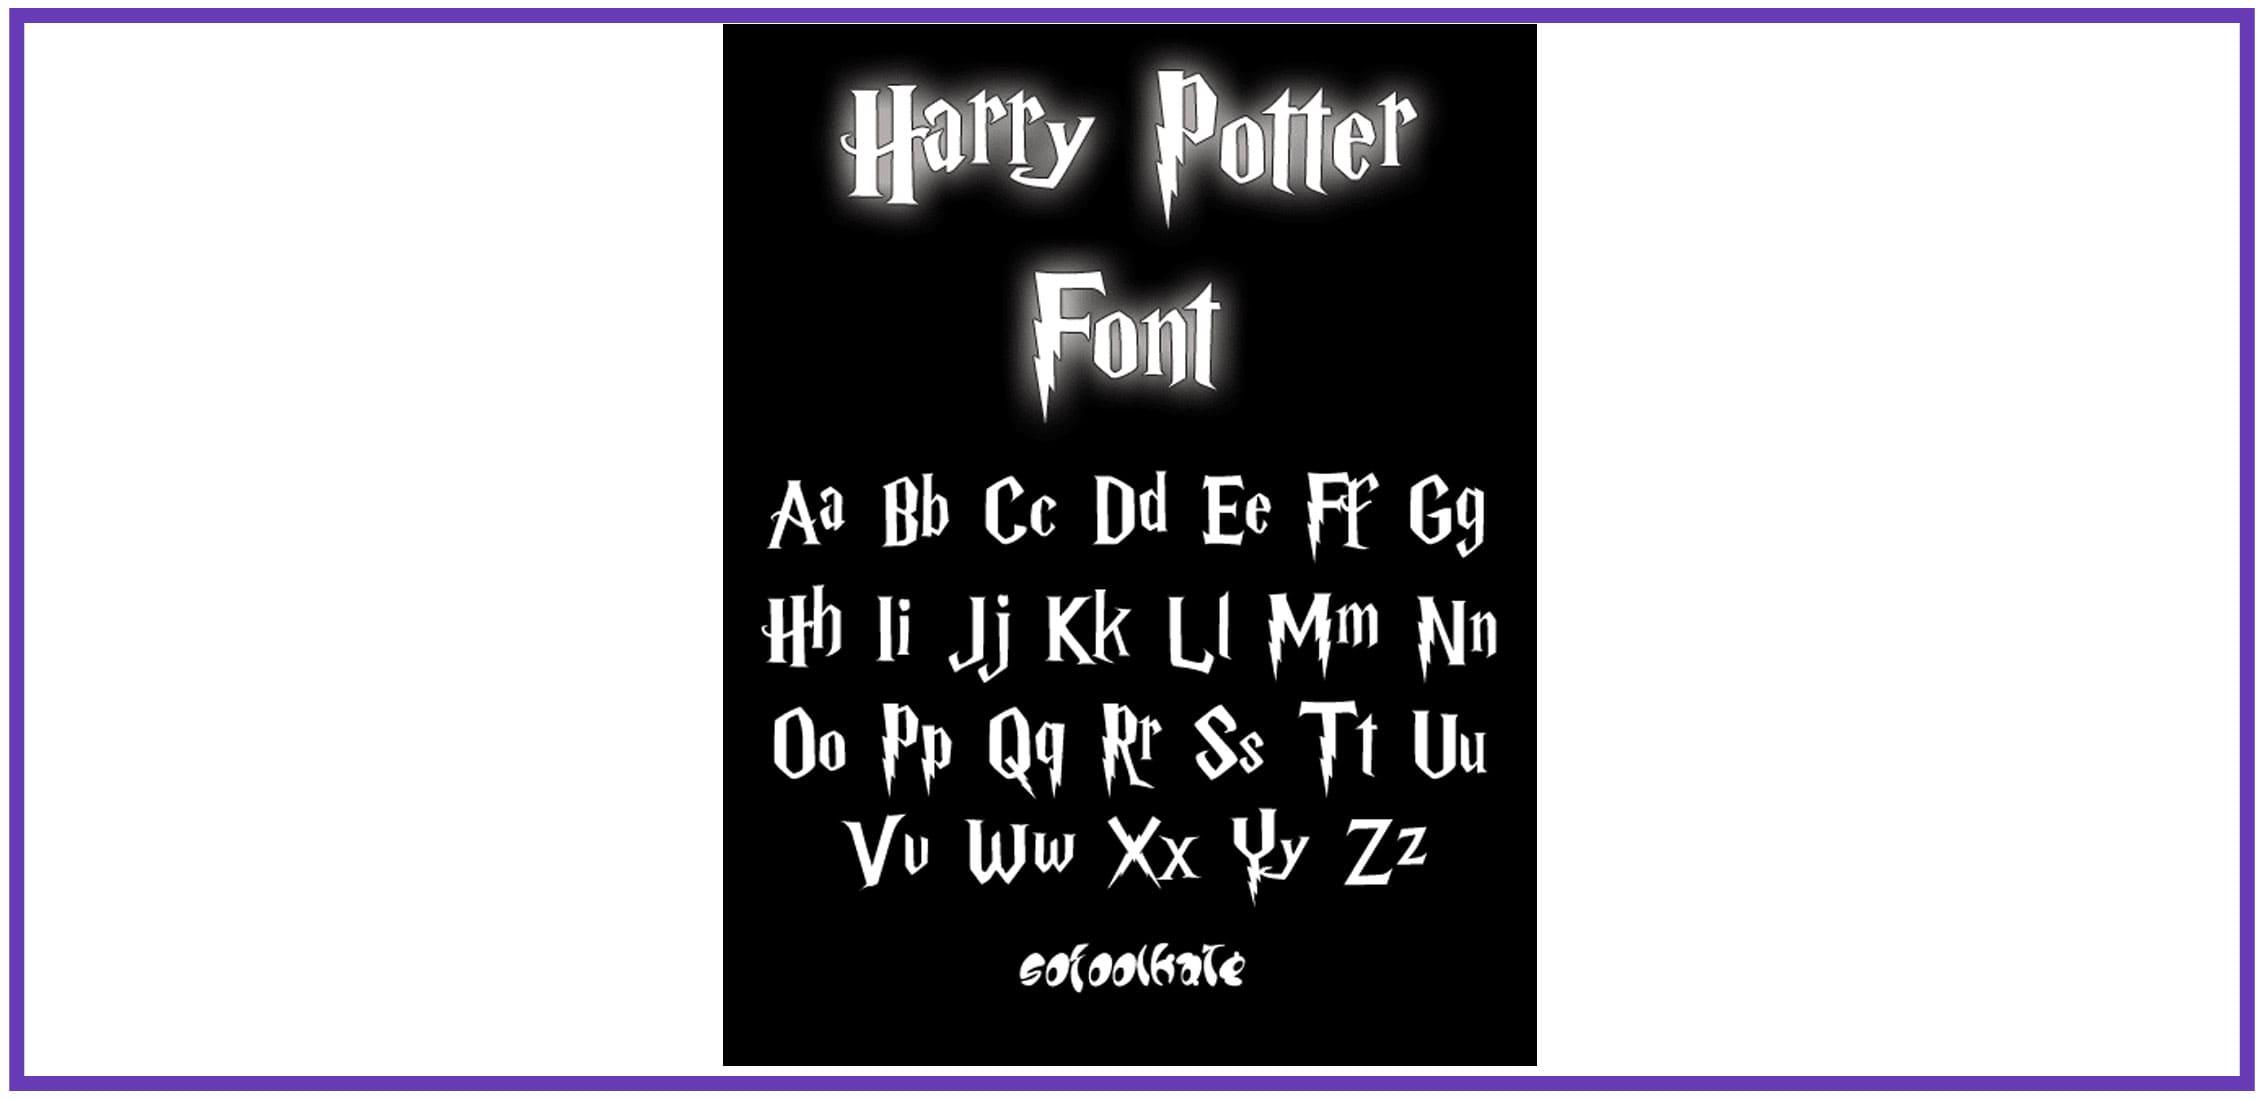 Serif fun font against black background.